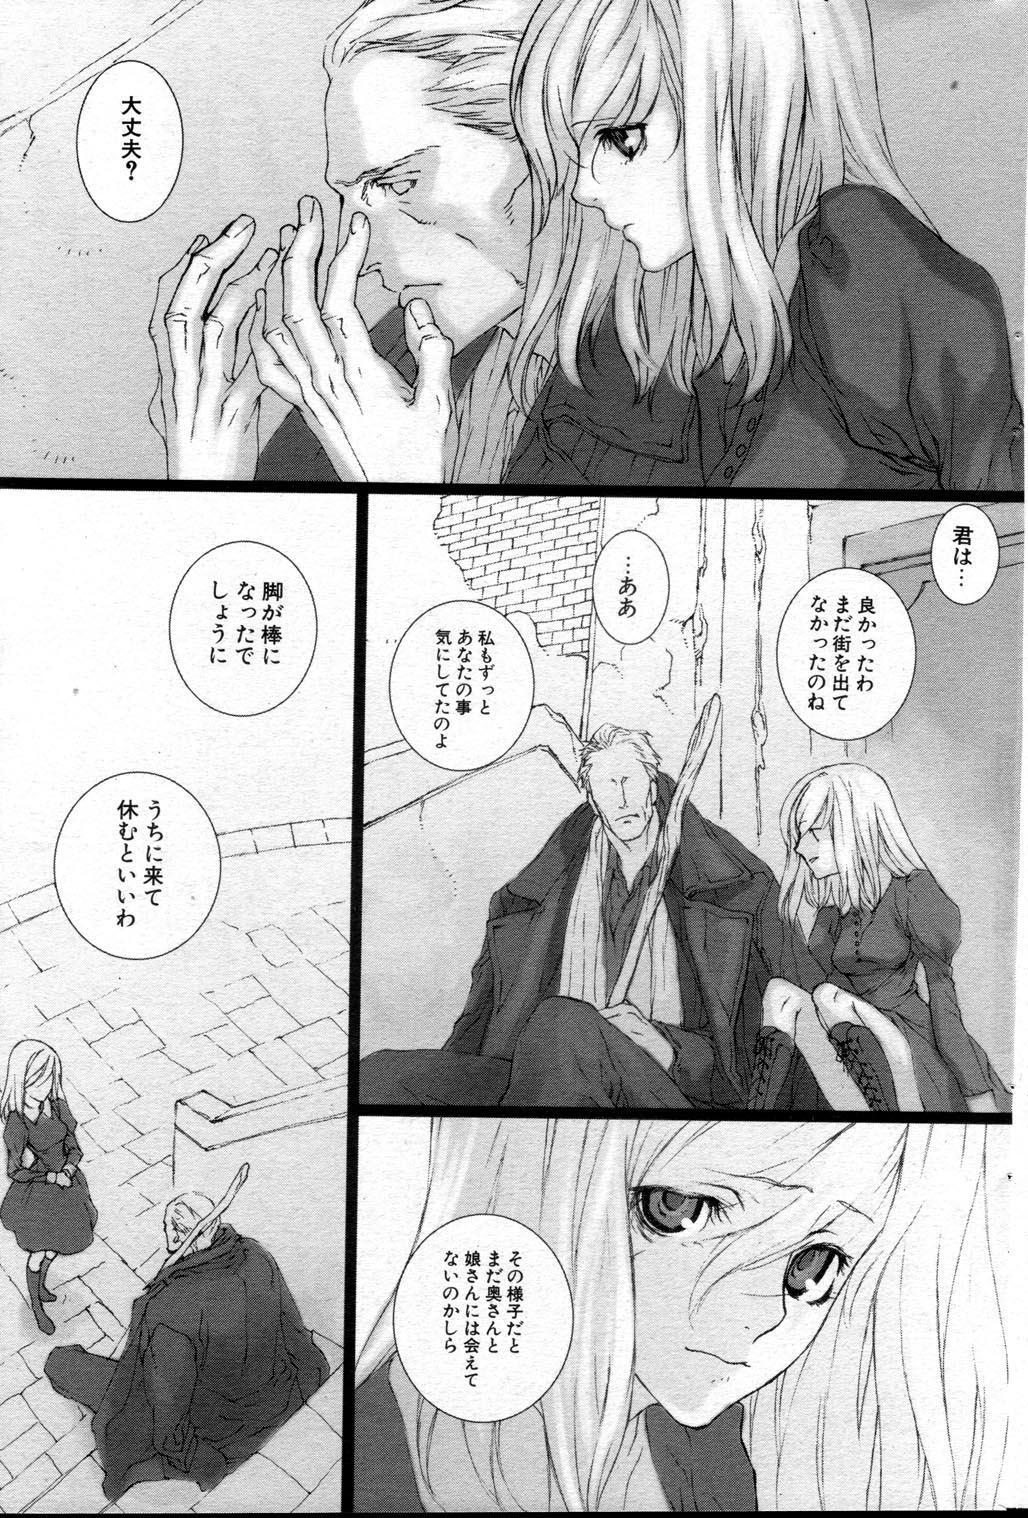 [Saiki Keita] FAIRY GONE GARDEN (Part Two) Kouhen 6